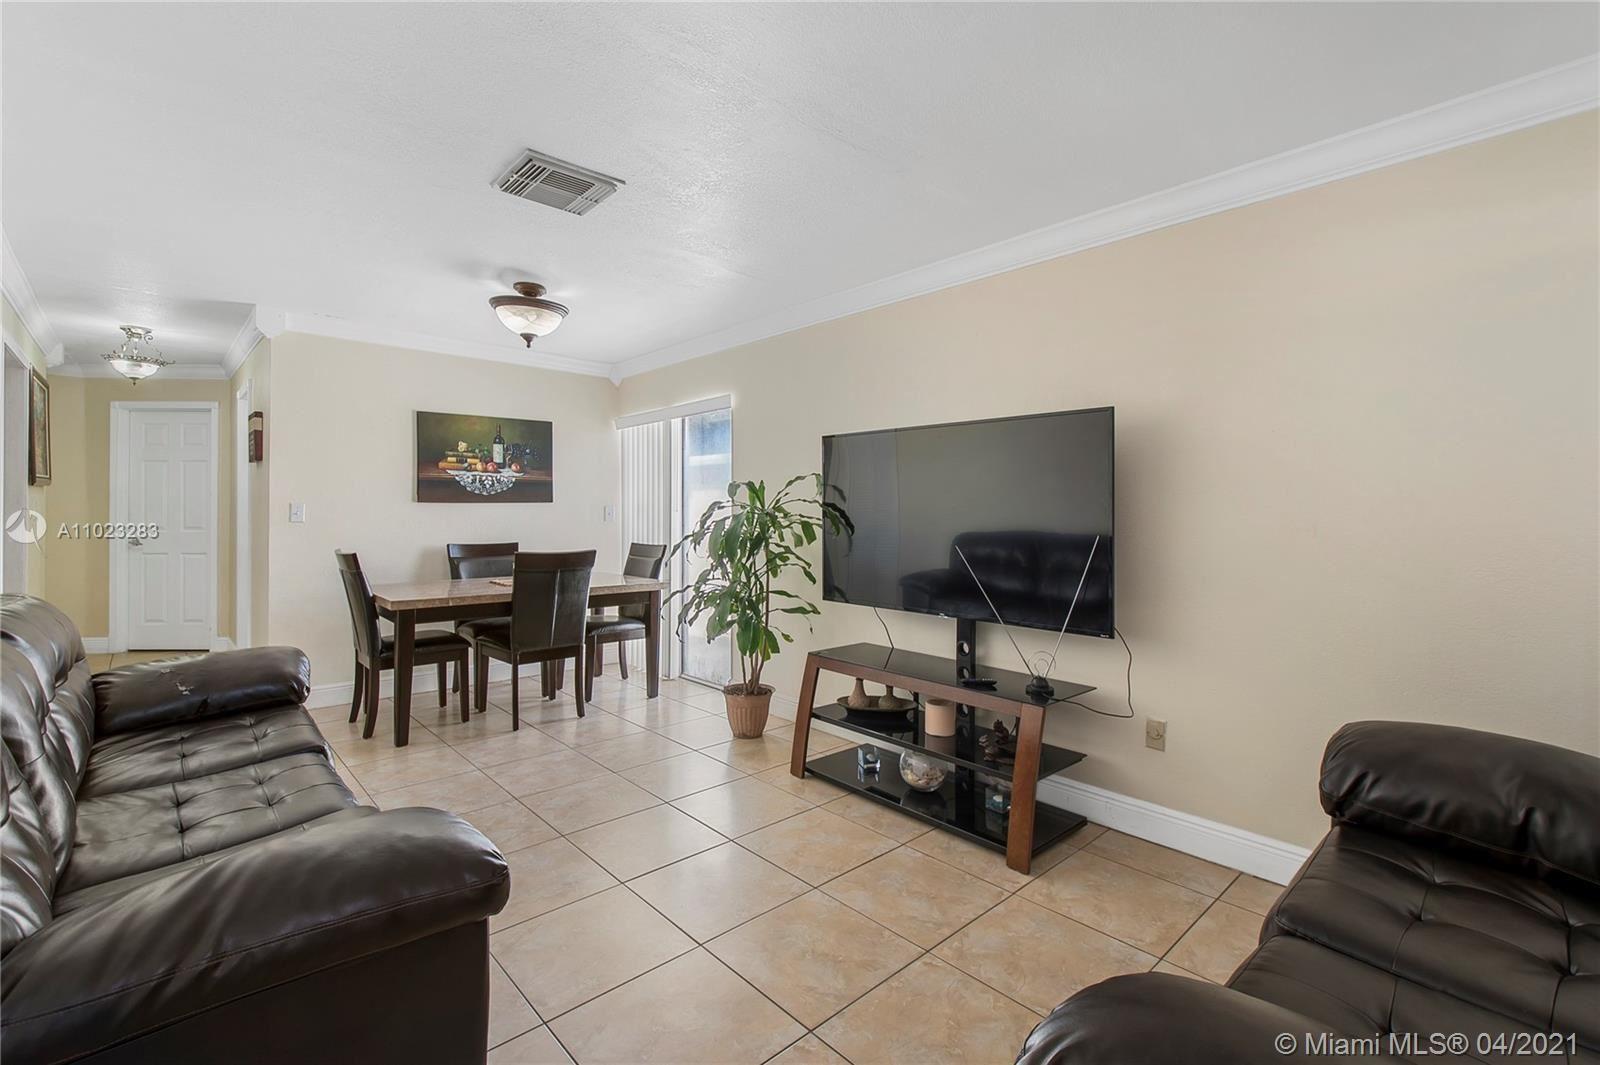 Photo of 8426 SW 38 St #7, Miami, FL 33155 (MLS # A11023283)